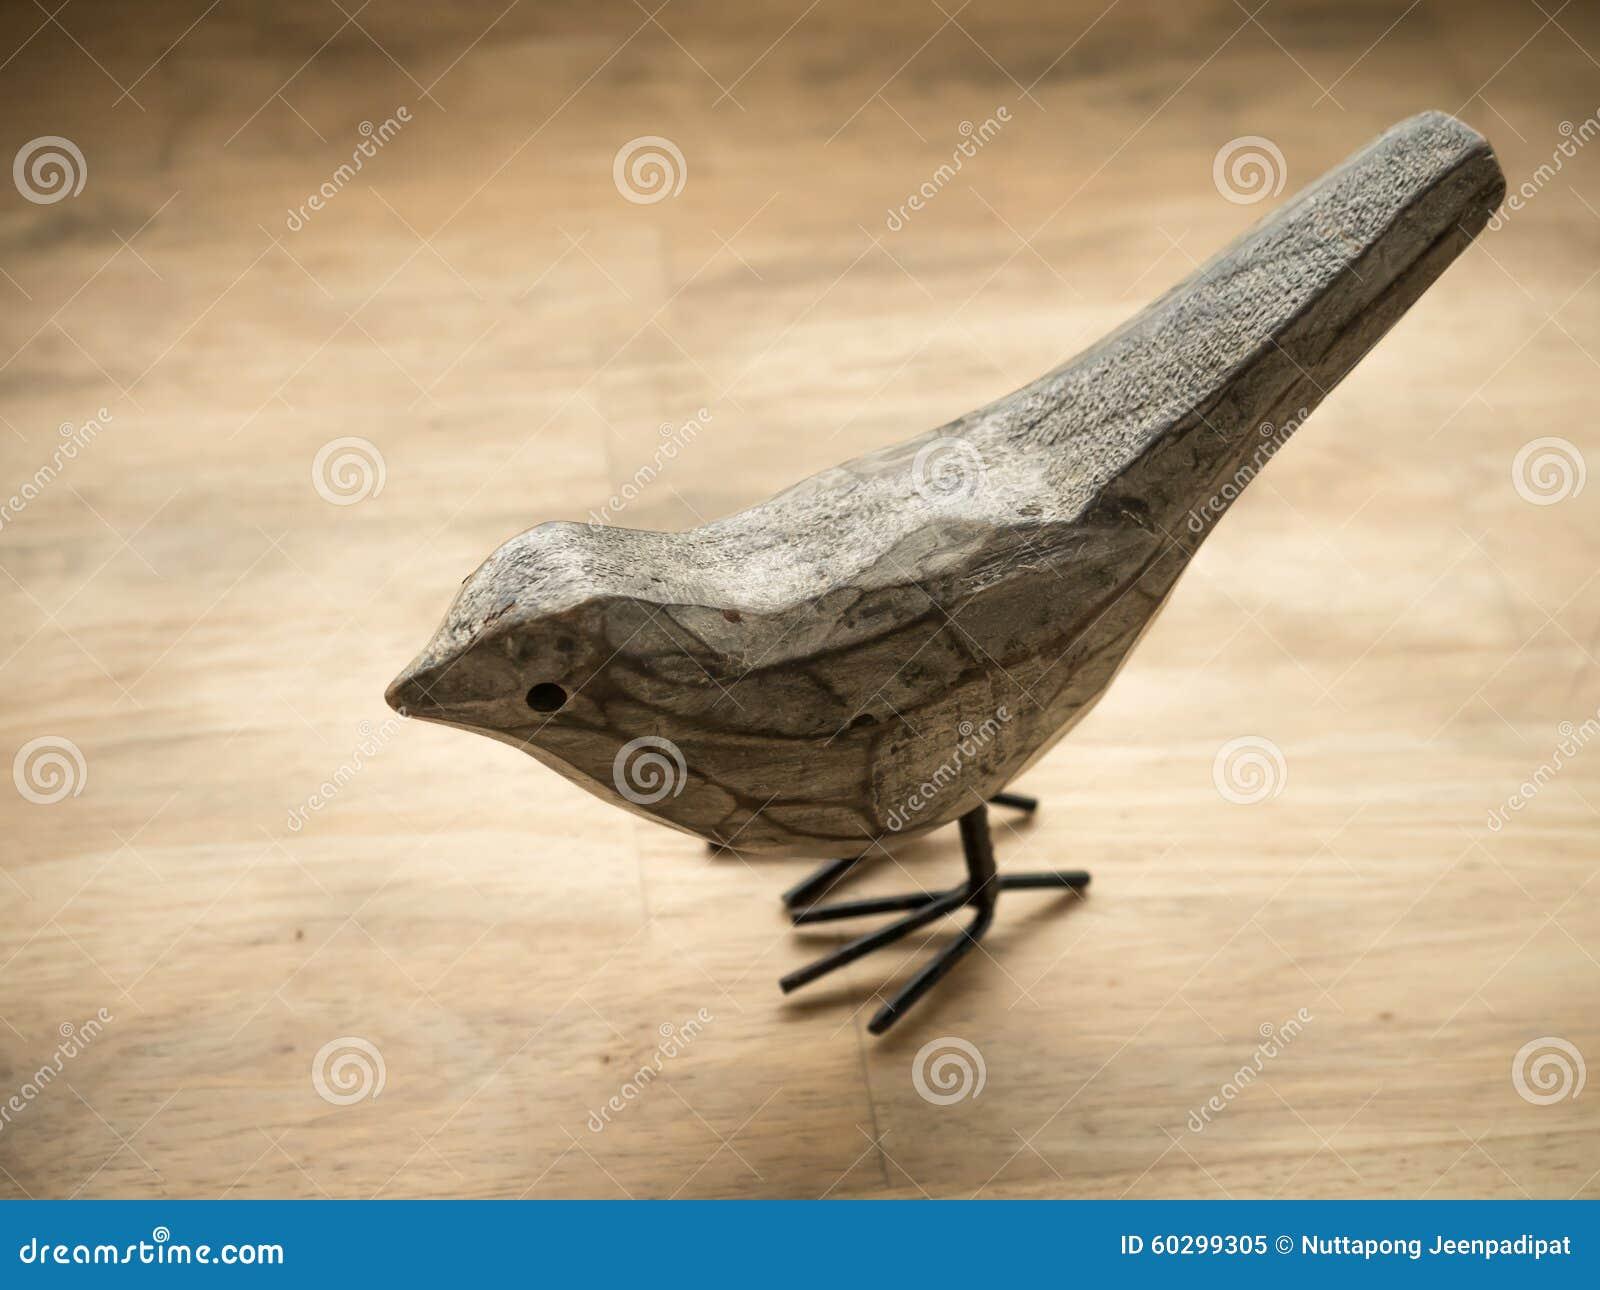 Wooden Bird Sculpture Stock Photo Image 60299305